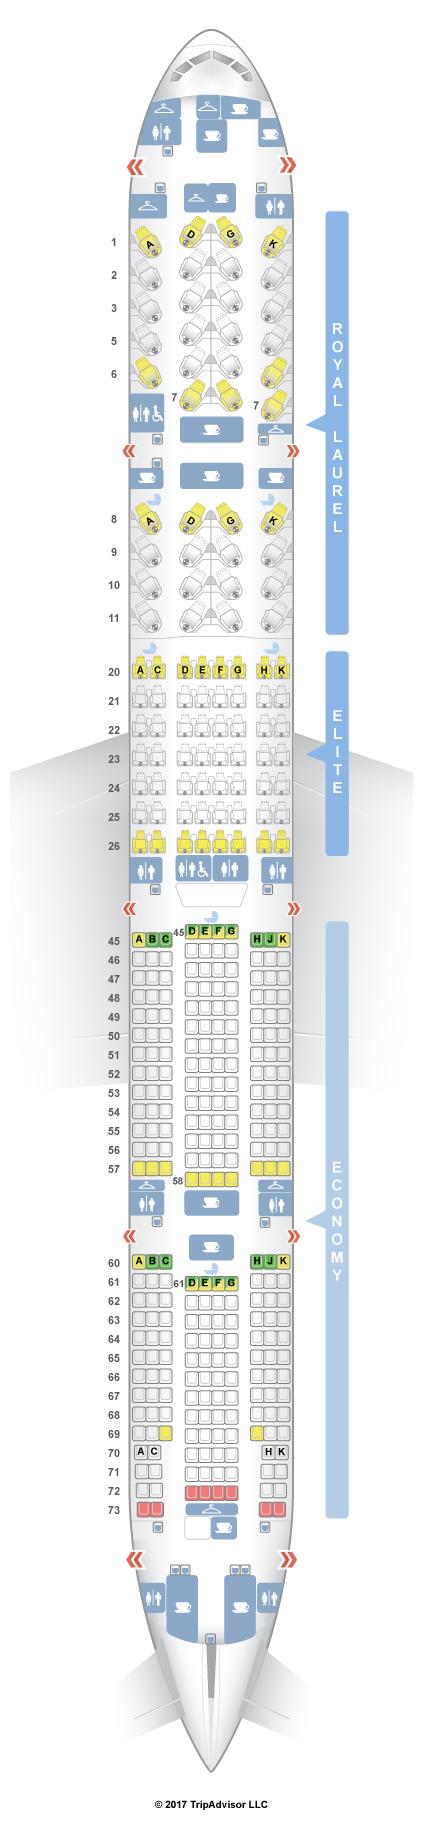 SeatGuru Seat Map EVA Air Boeing 777-300ER (77B) V4